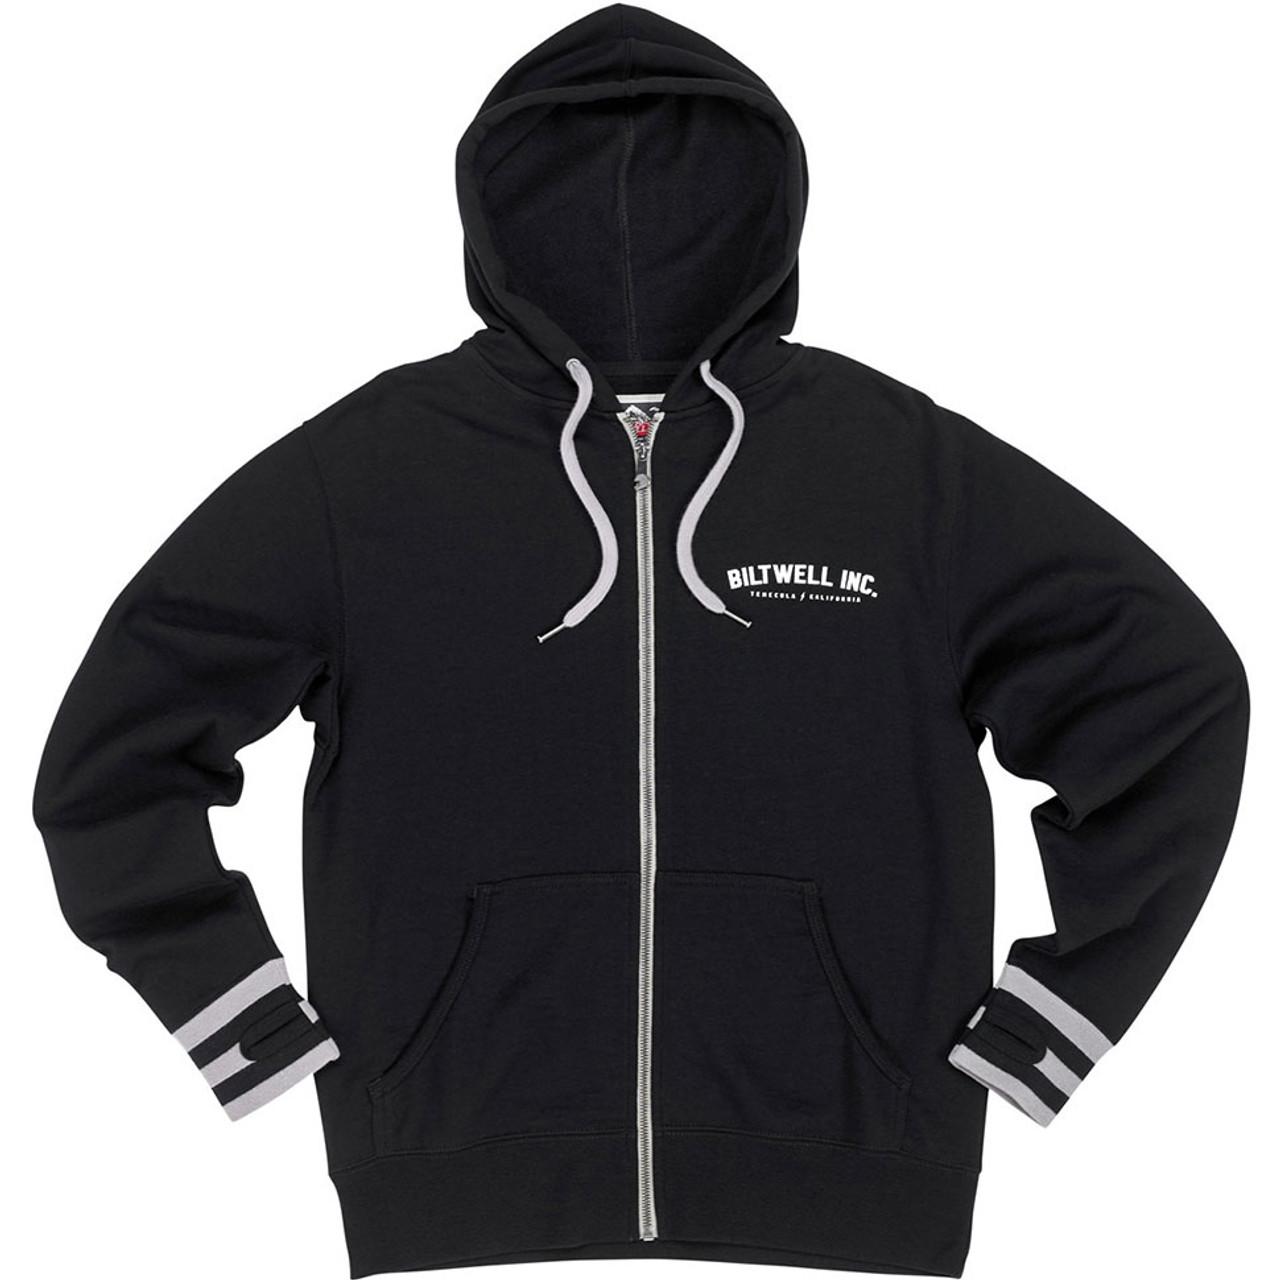 aad32f32a Biltwell Basic Black Zip Hoodie